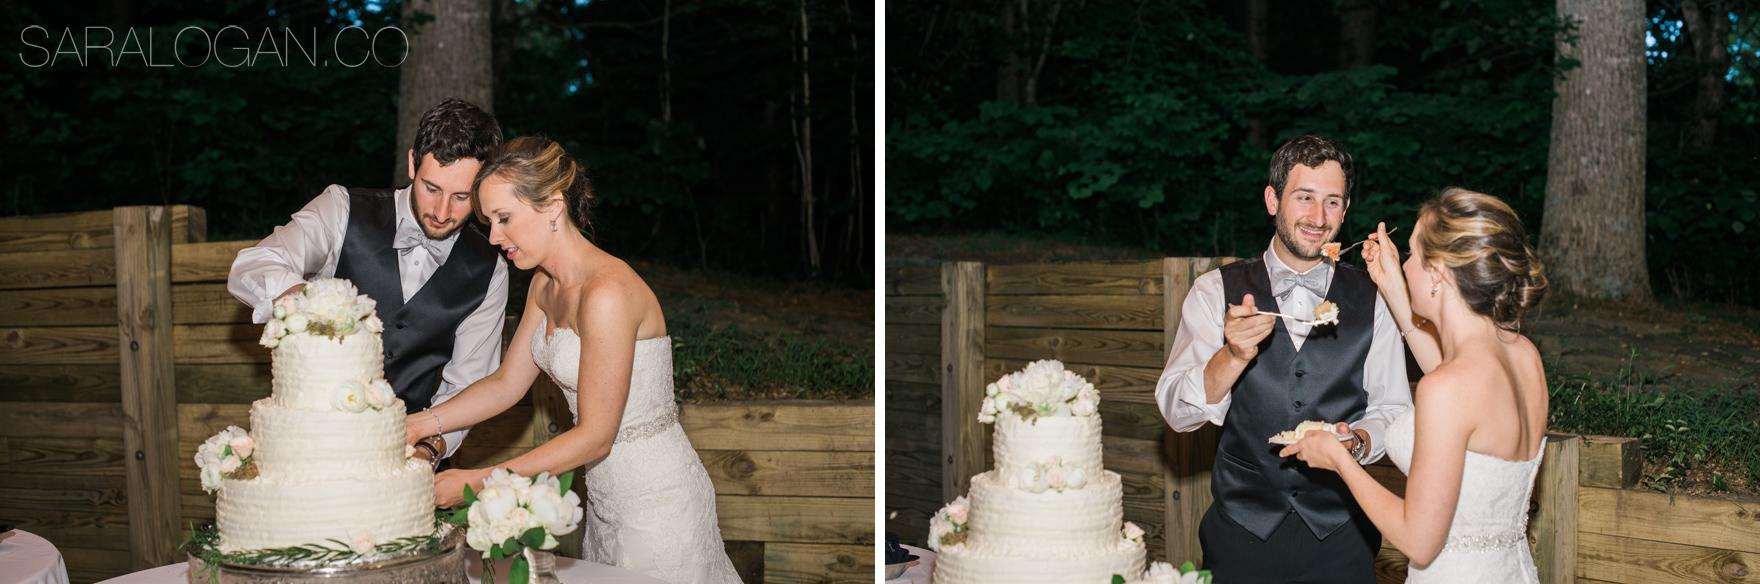 brasstown bald wedding photos